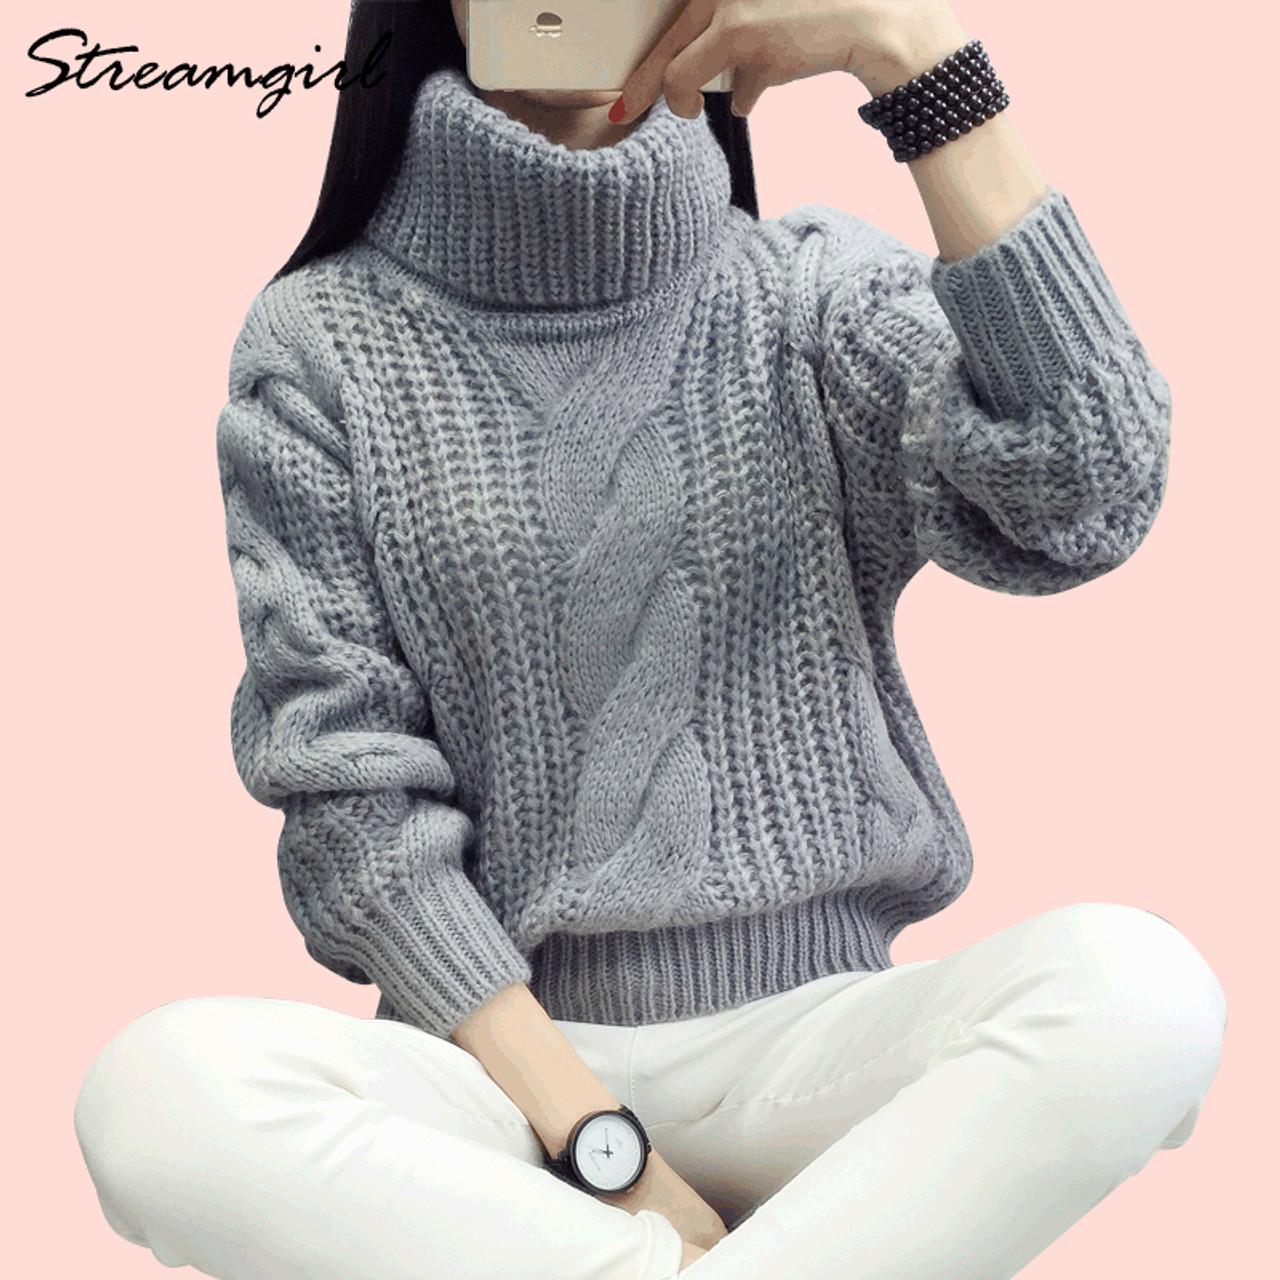 cade71933c Women s Turtleneck Warm Sweater Coarse Knitted Pull Femme Hiver Truien  Winter 2018 Truien Dames Oversized Warm Sweater Women - OnshopDeals.Com